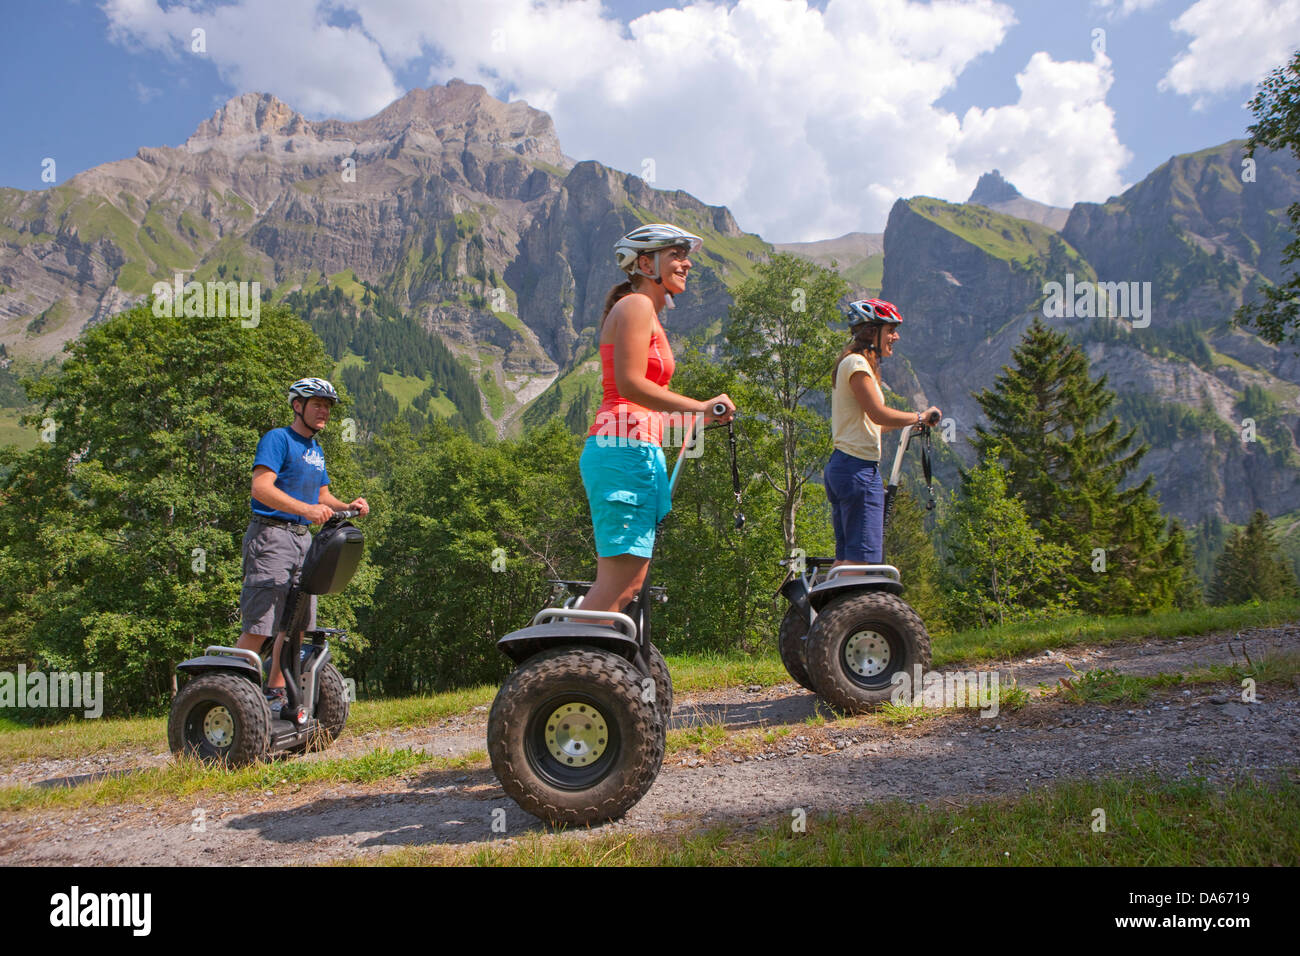 Segway, Zweirad, Fahrzeug, persönliche Transporter fahren, Adelboden, Wanderweg, walking, Wandern, trekking, Stockbild